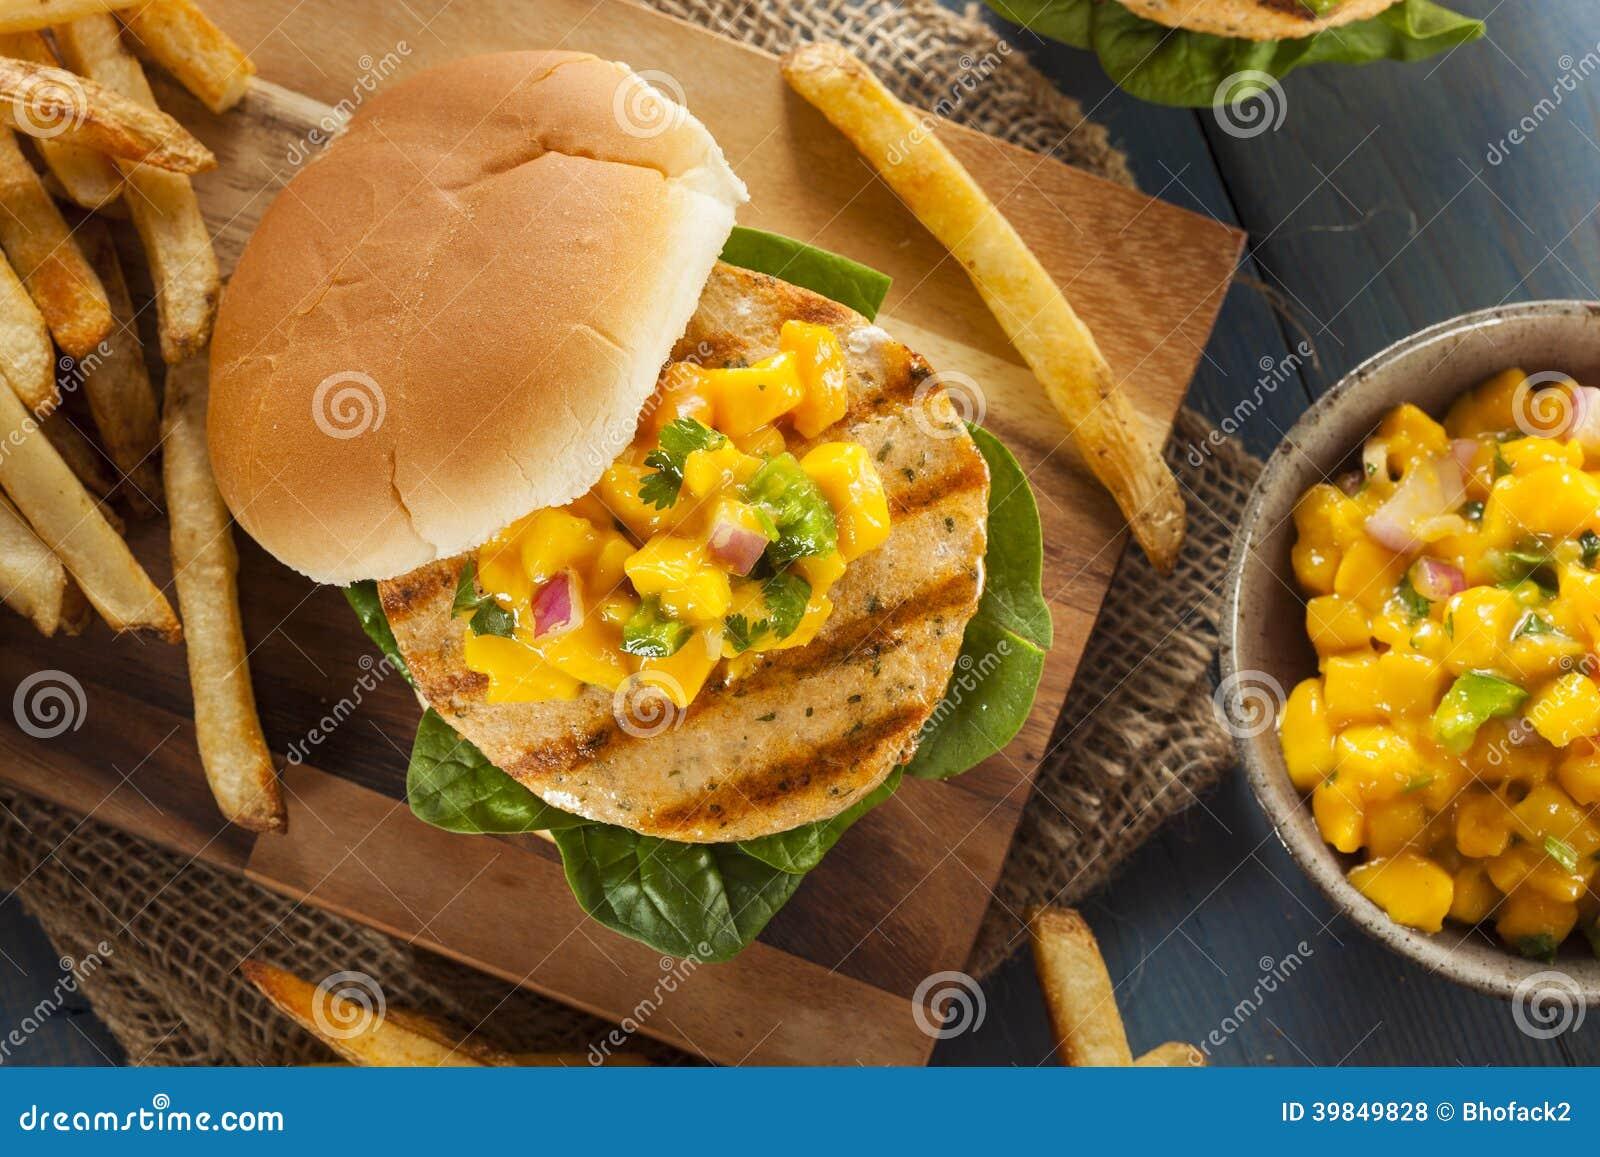 Mahi Fish Sandwich with Salsa